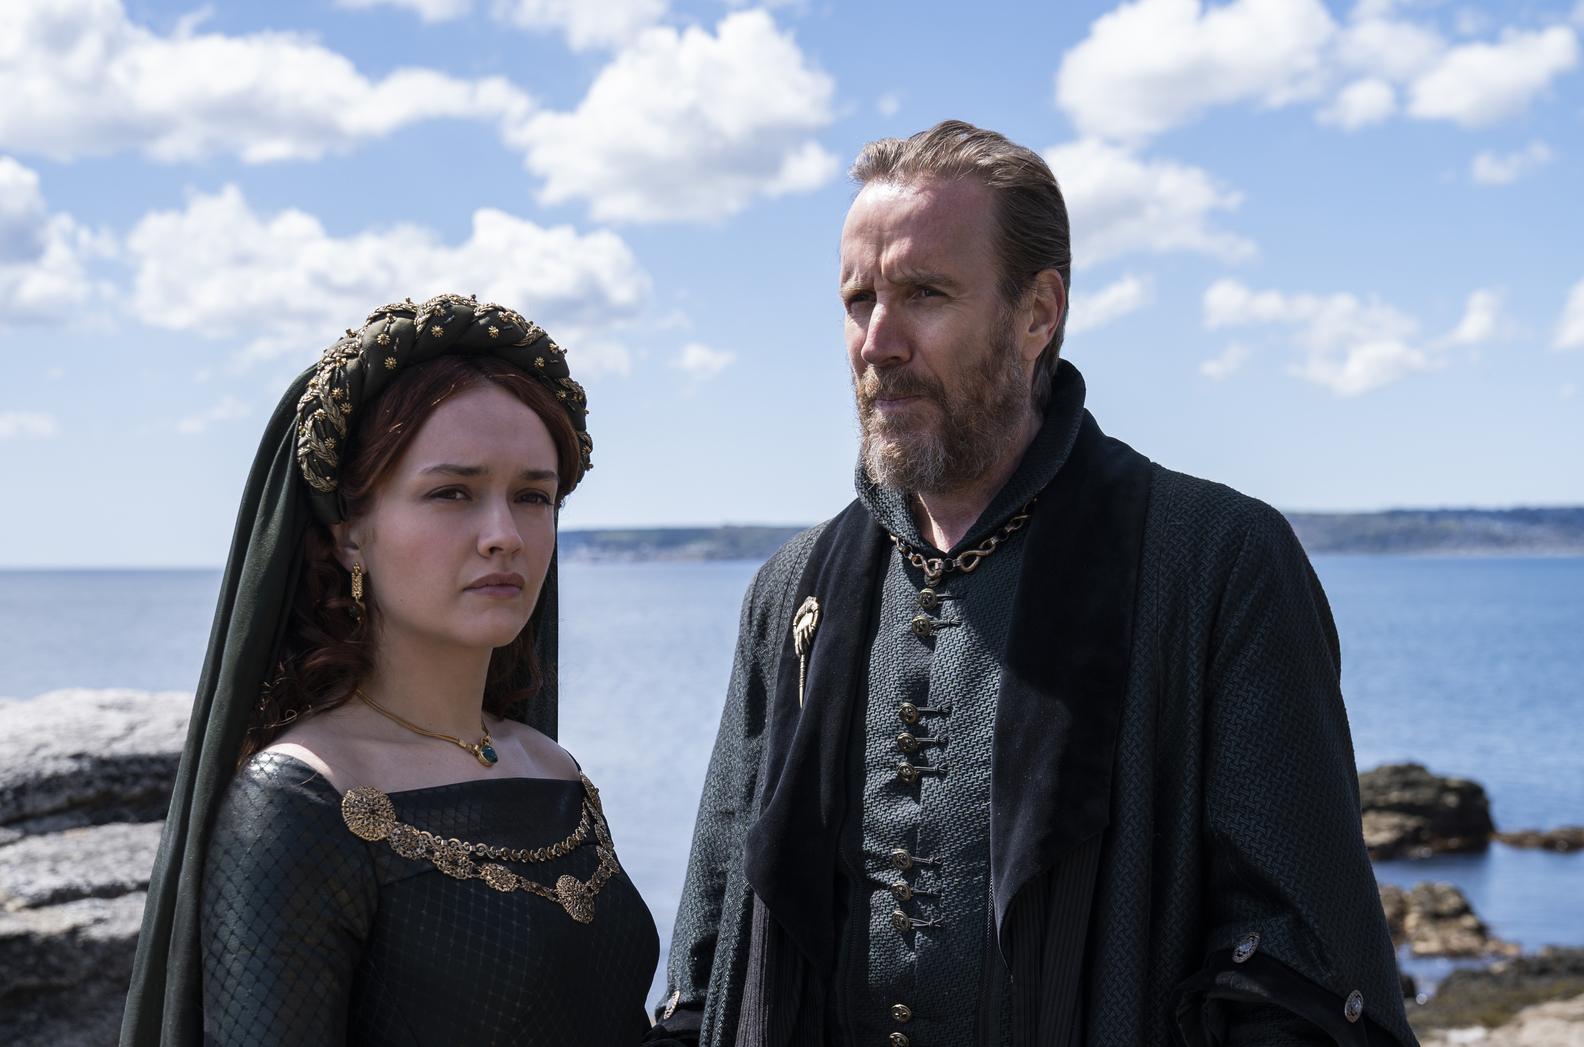 A atriz Olivia Cooke como Alicent Hightower e Rhys Ifans como Otto Hightower na série 'The House of The Dragon' -